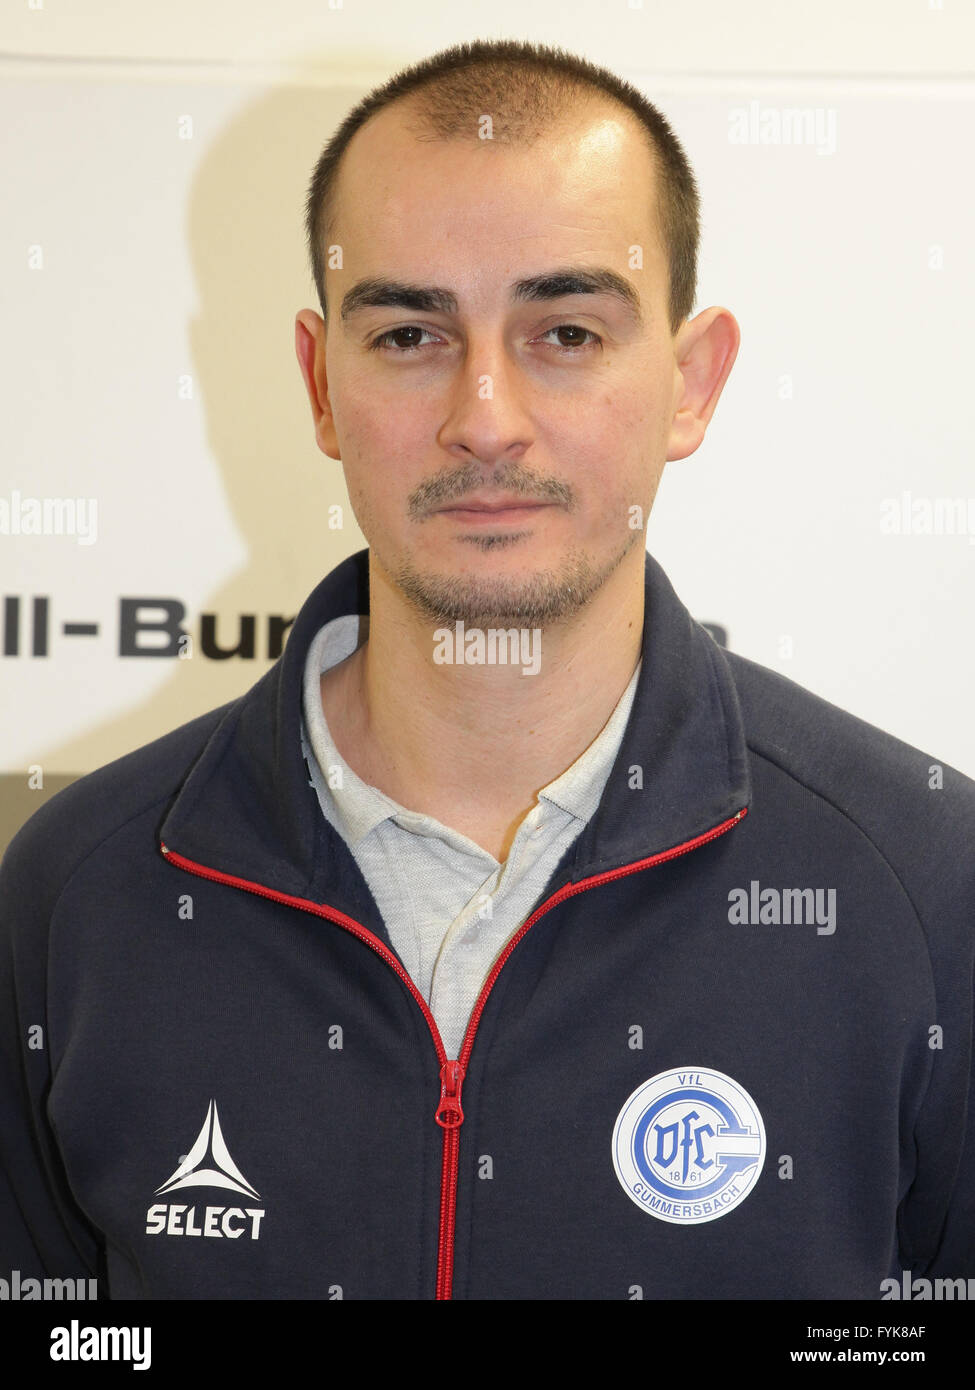 Emir Kurtagic  (VfL Gummersbach) - Stock Image